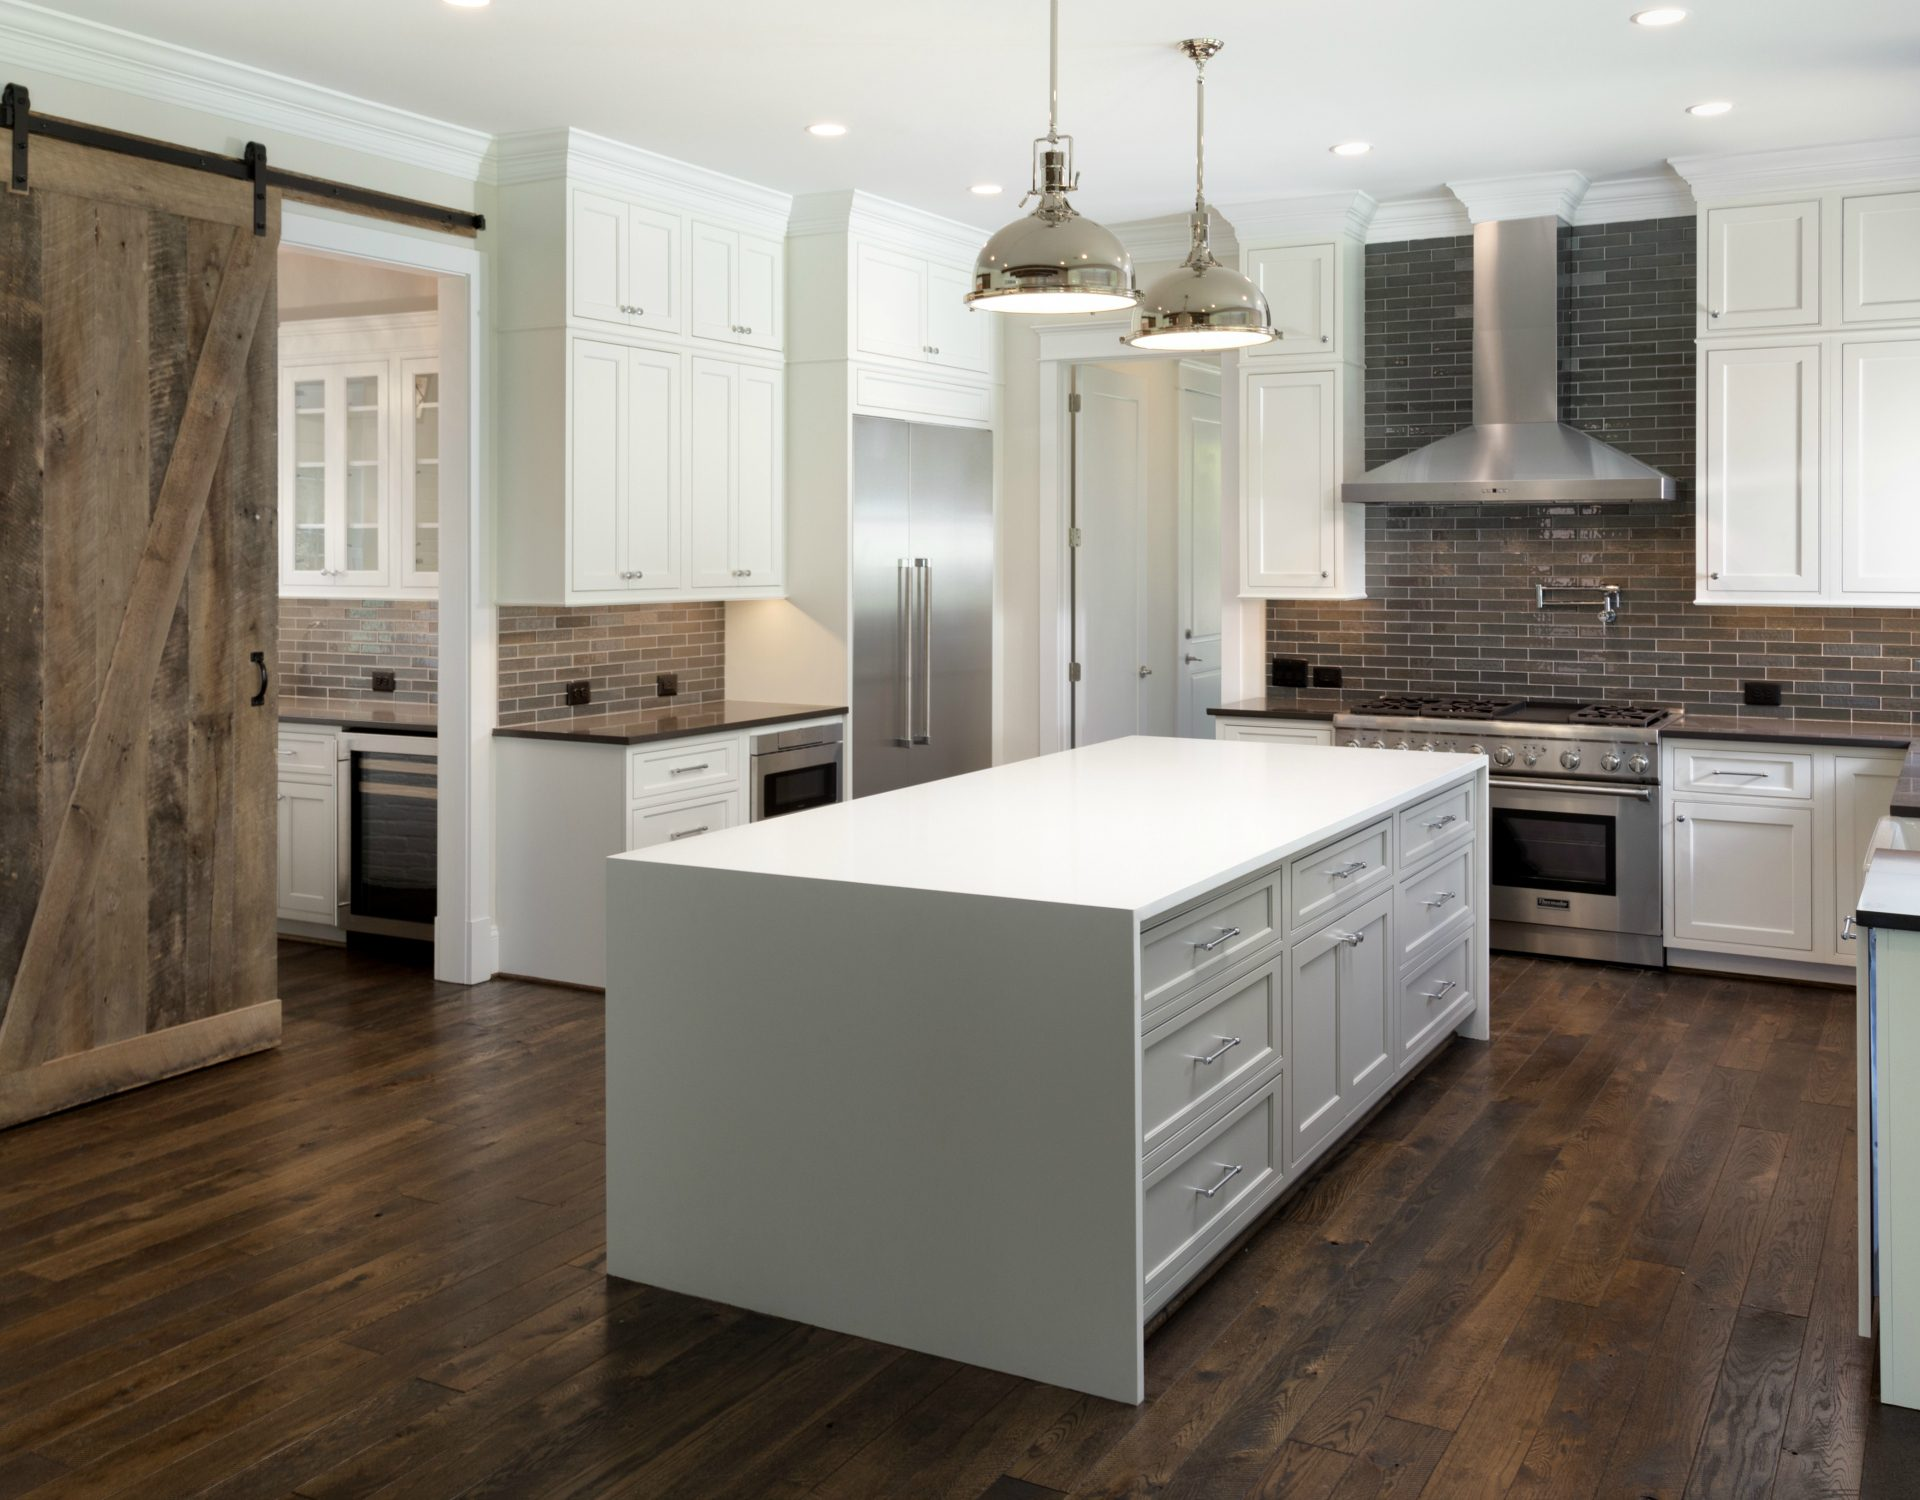 Dittmar Kitchen